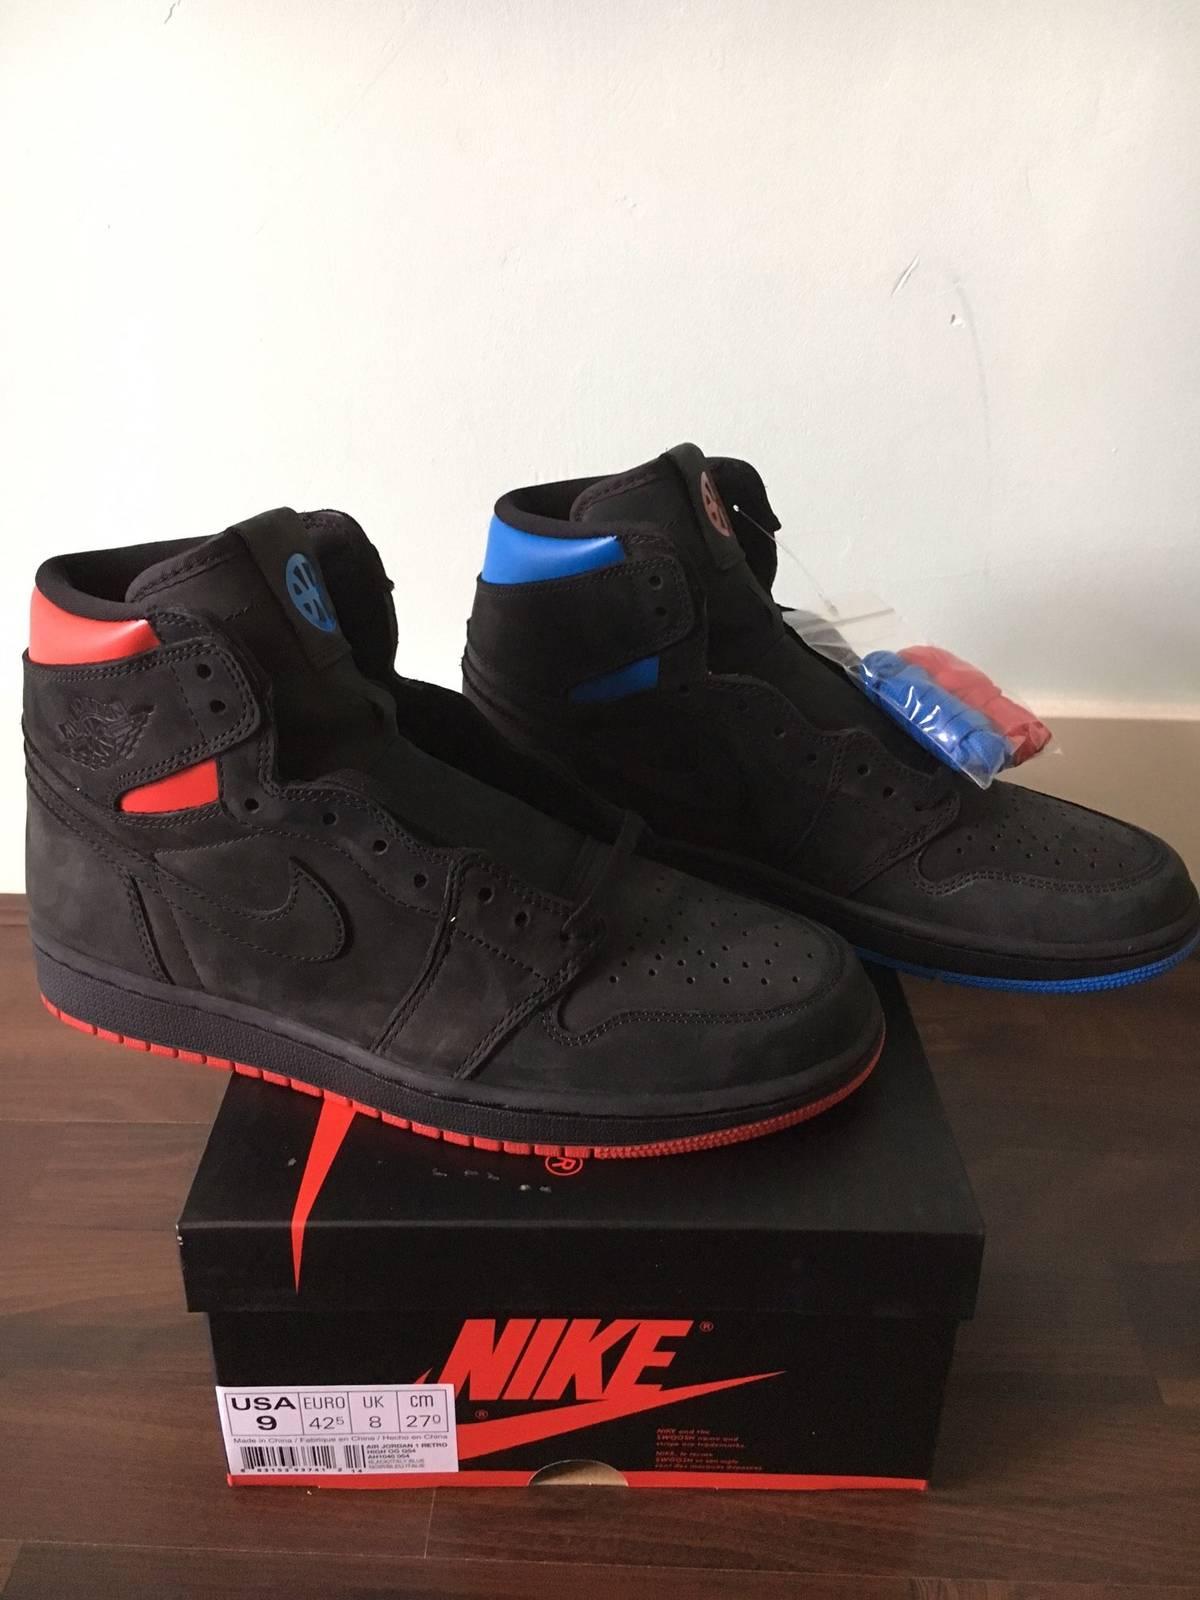 new product 1137c 068b7 ... Nike Air Jordan 1 Quai 54Q54 Retro High OG 9US - photo 1